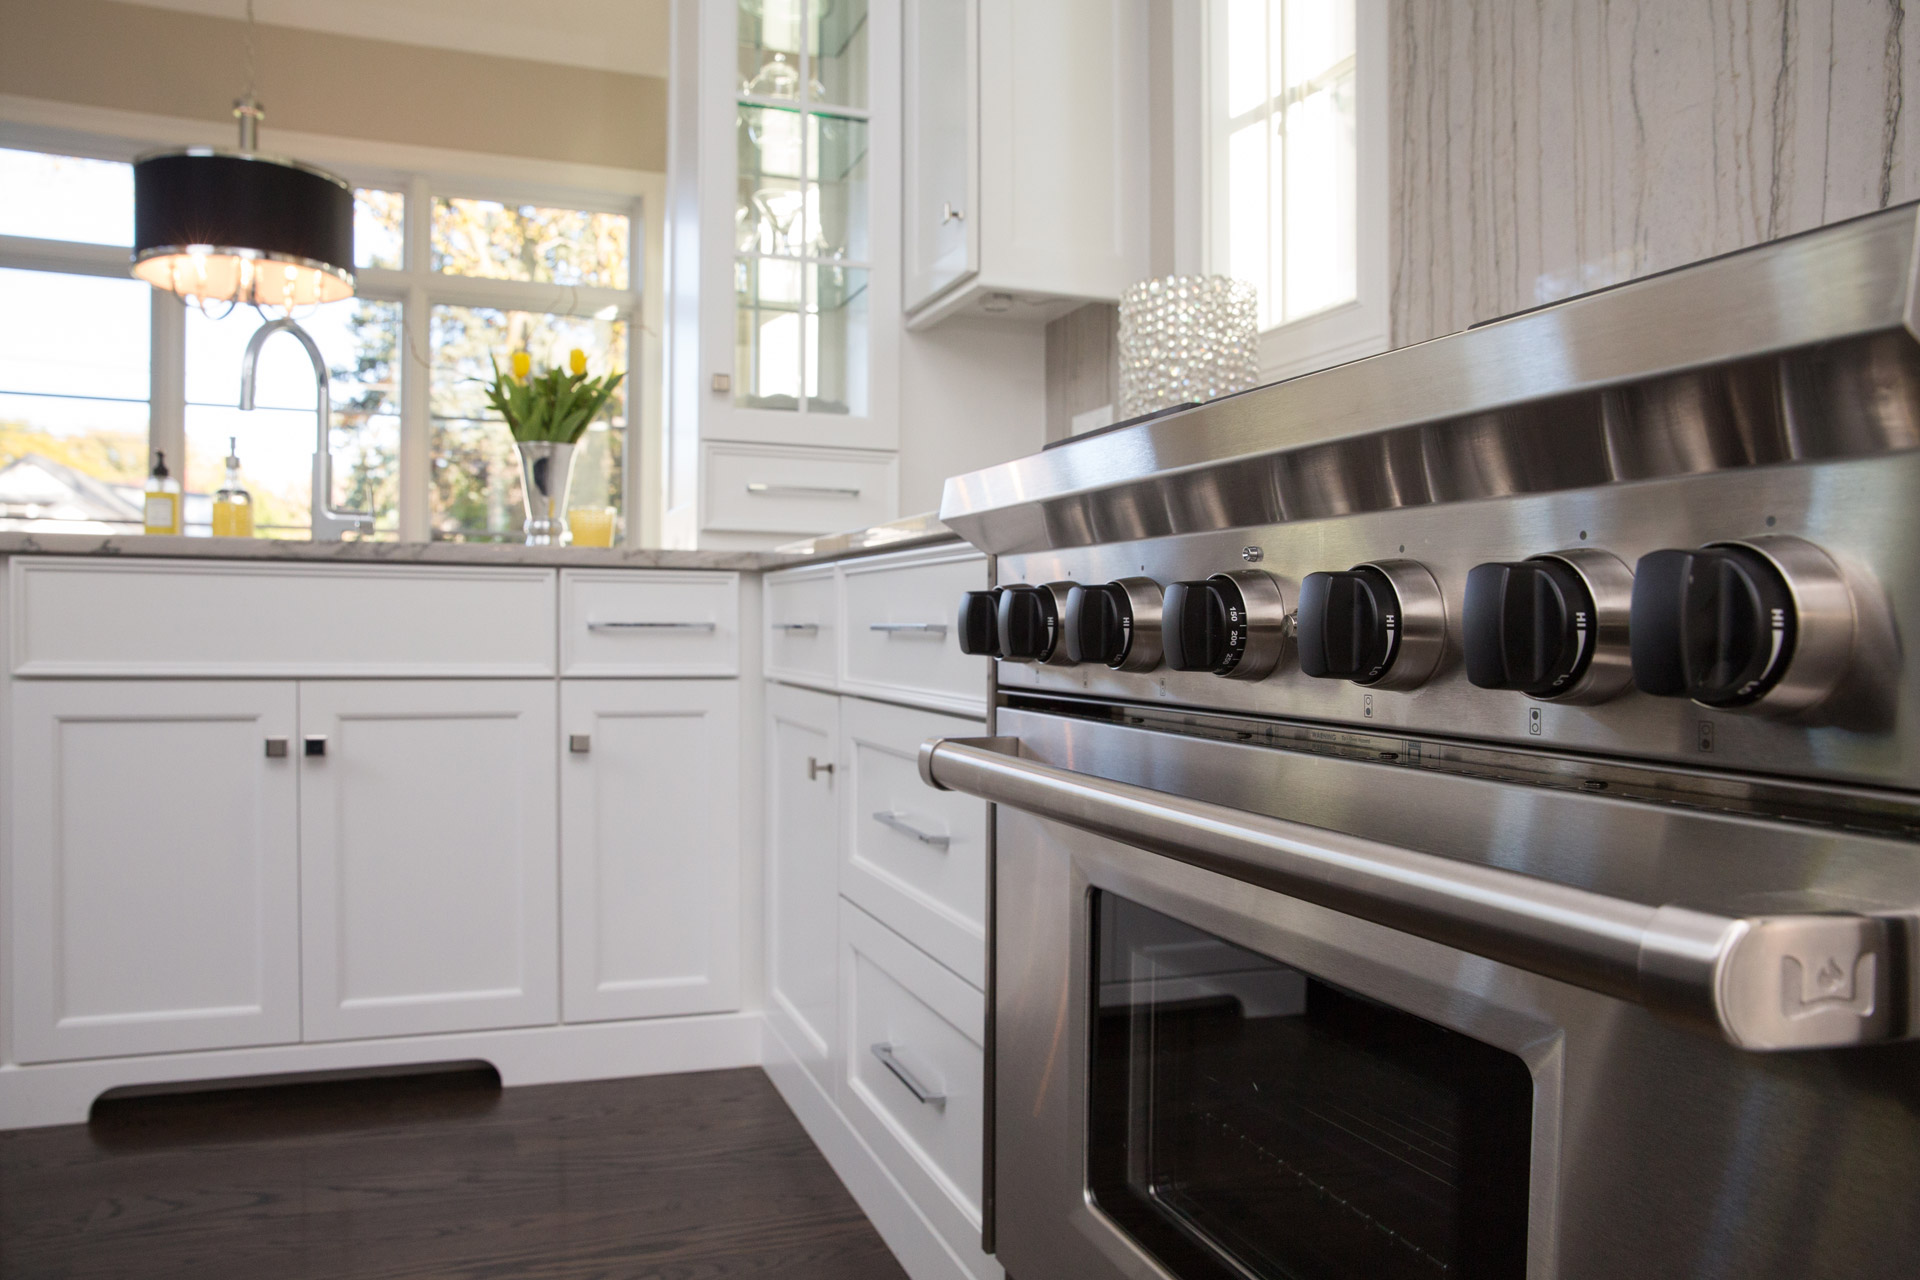 Wolf Appliances Kitchen Stove Oven Range Stainless Steel